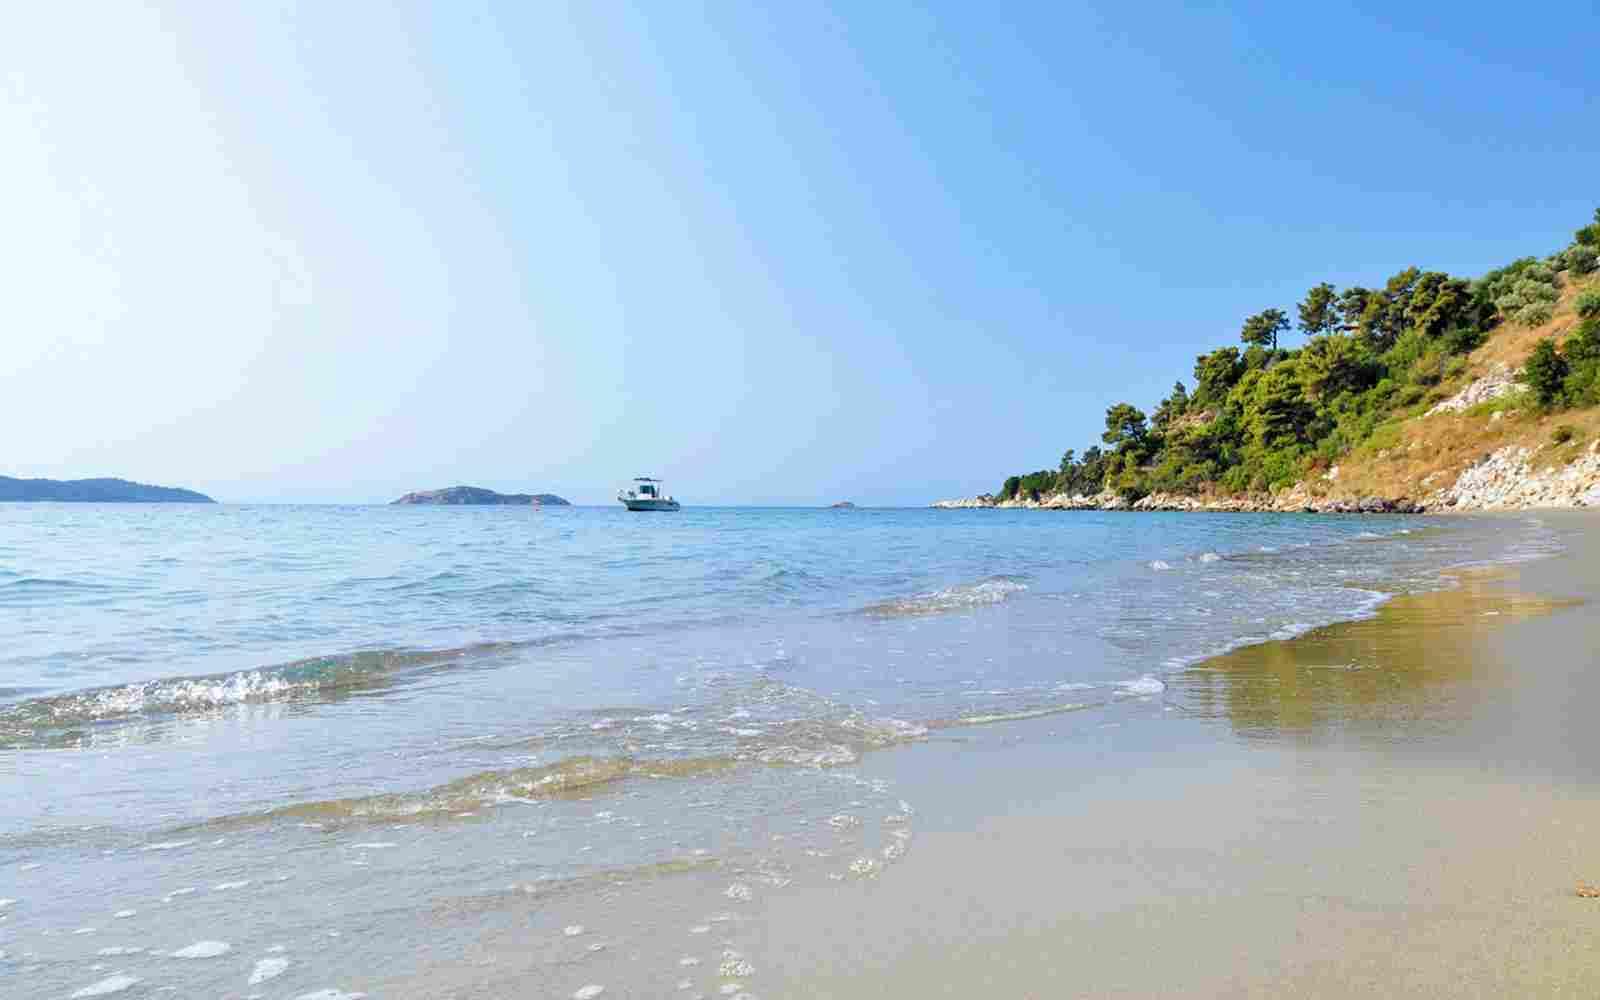 http://www.casacaribepuertomorelos.com/wp-content/uploads/2016/03/summer-beach-01.jpg